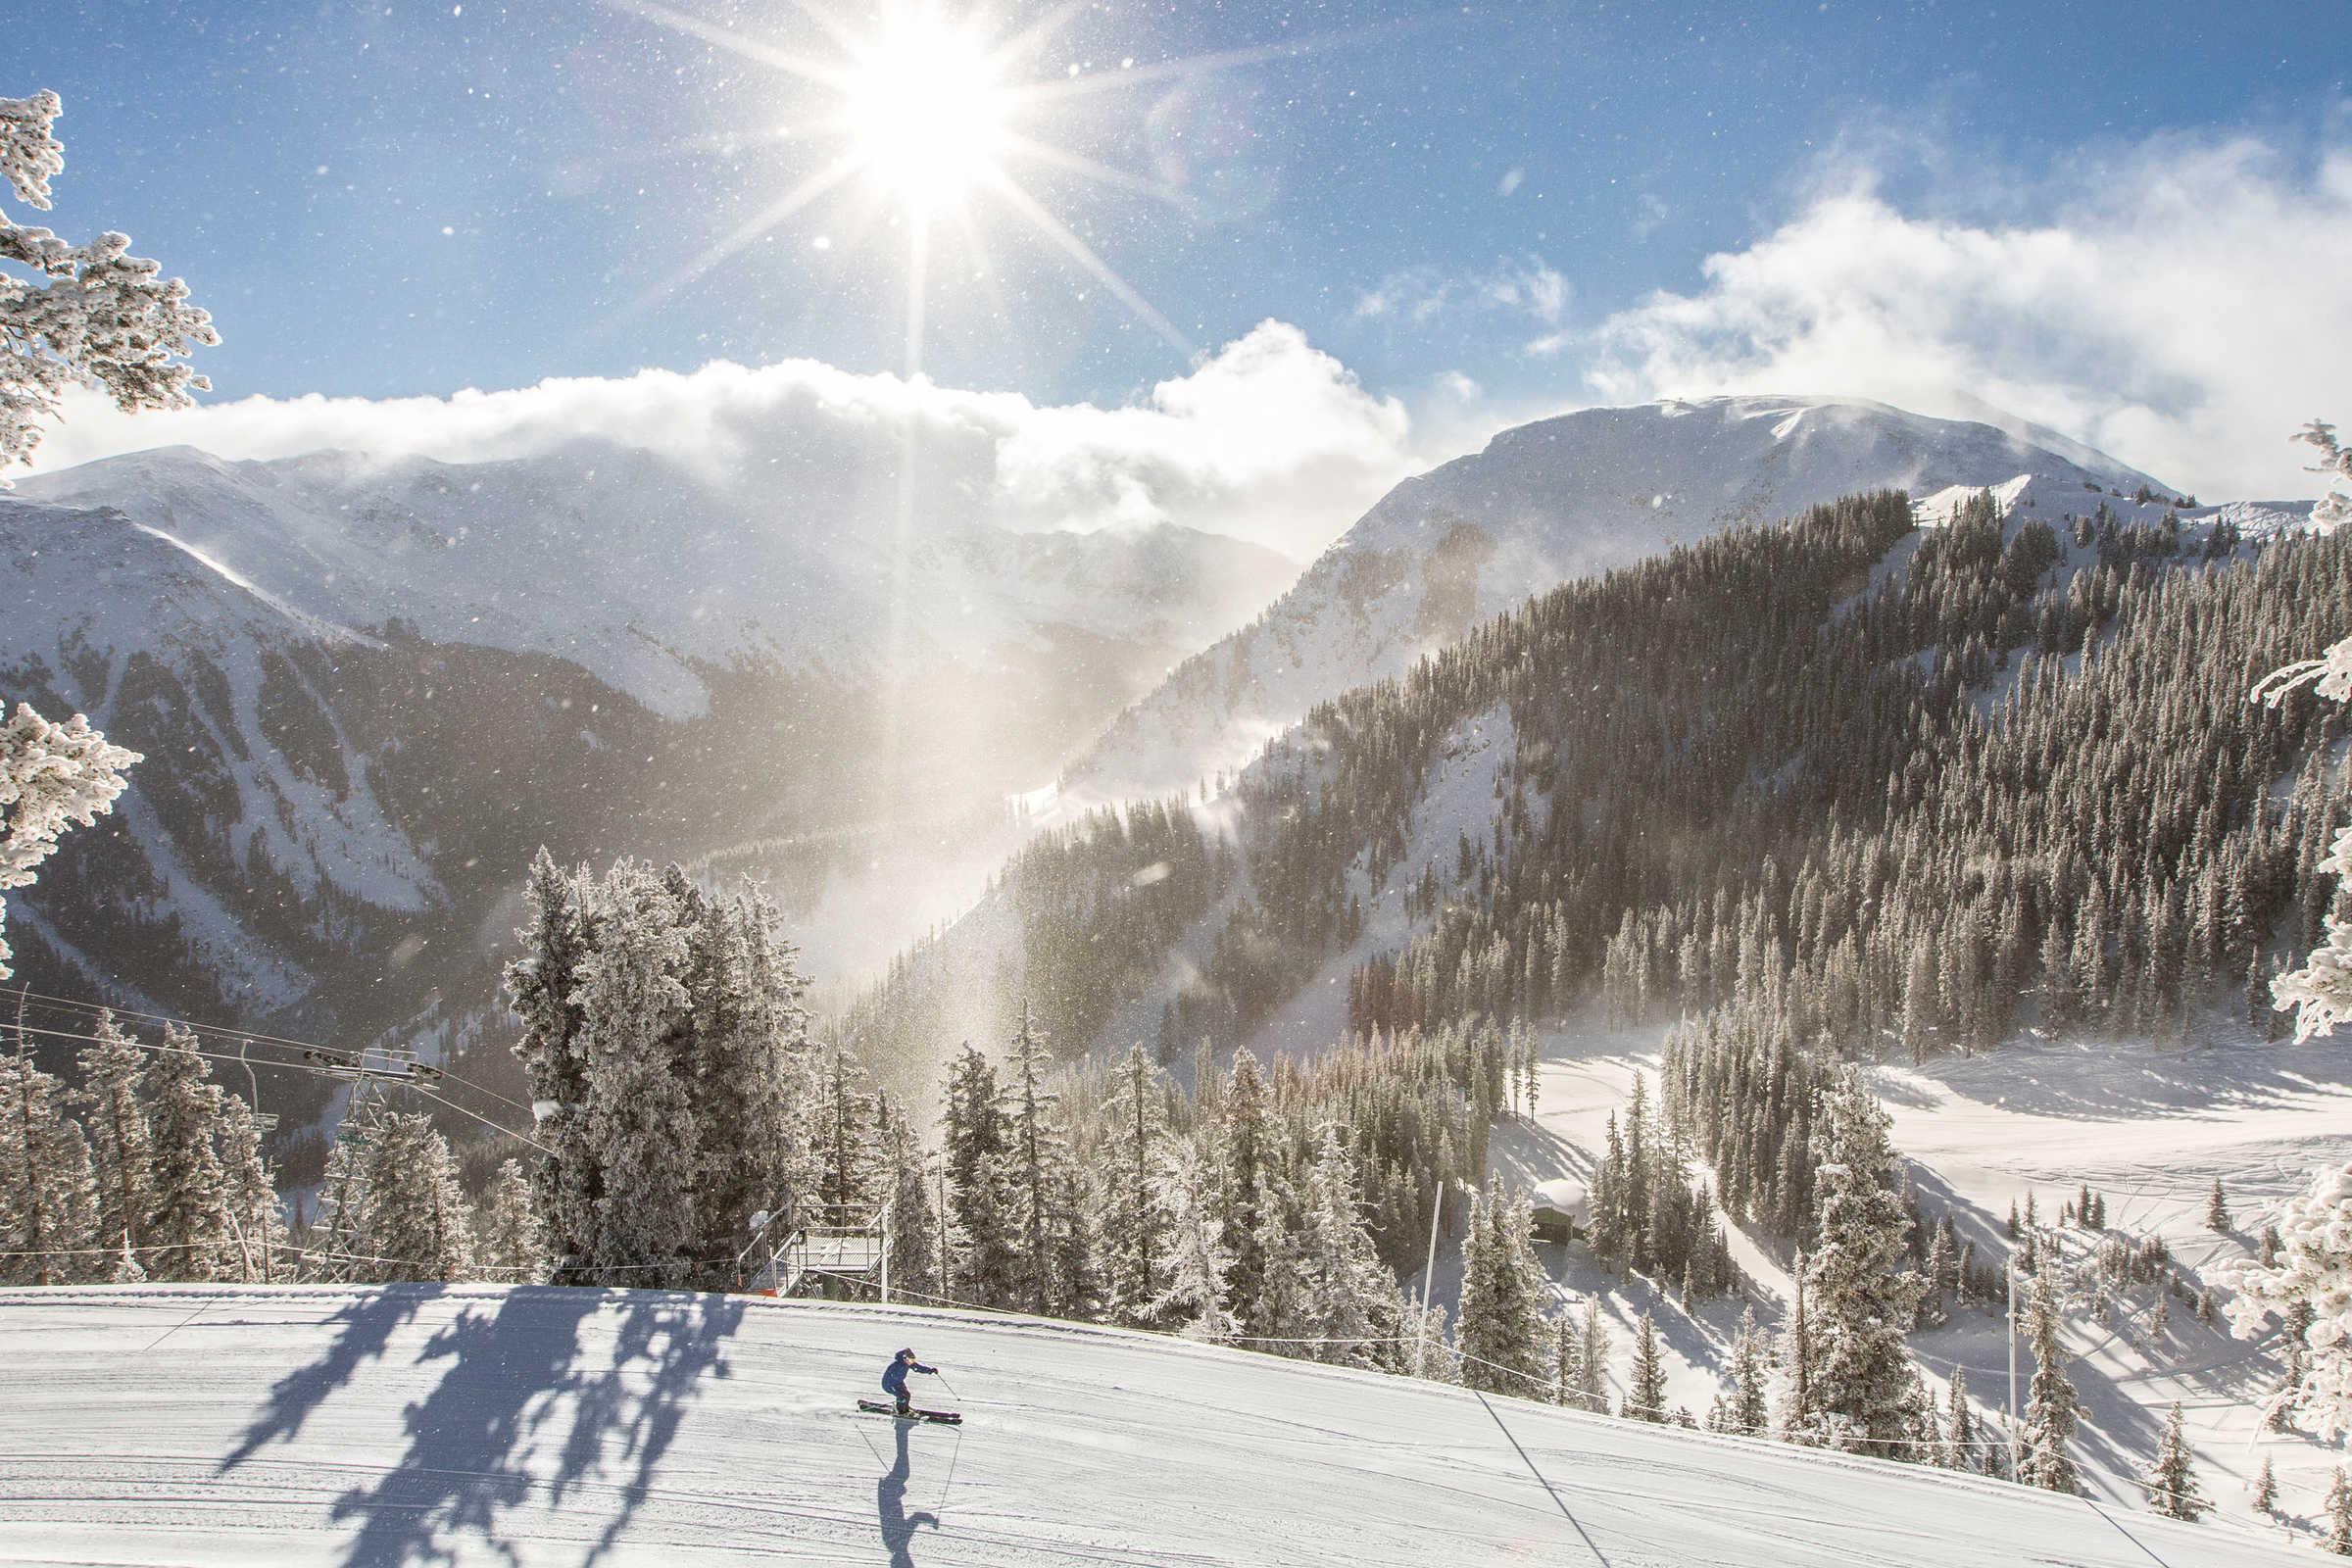 171207-ski-destinations-Taos-New-Mexico